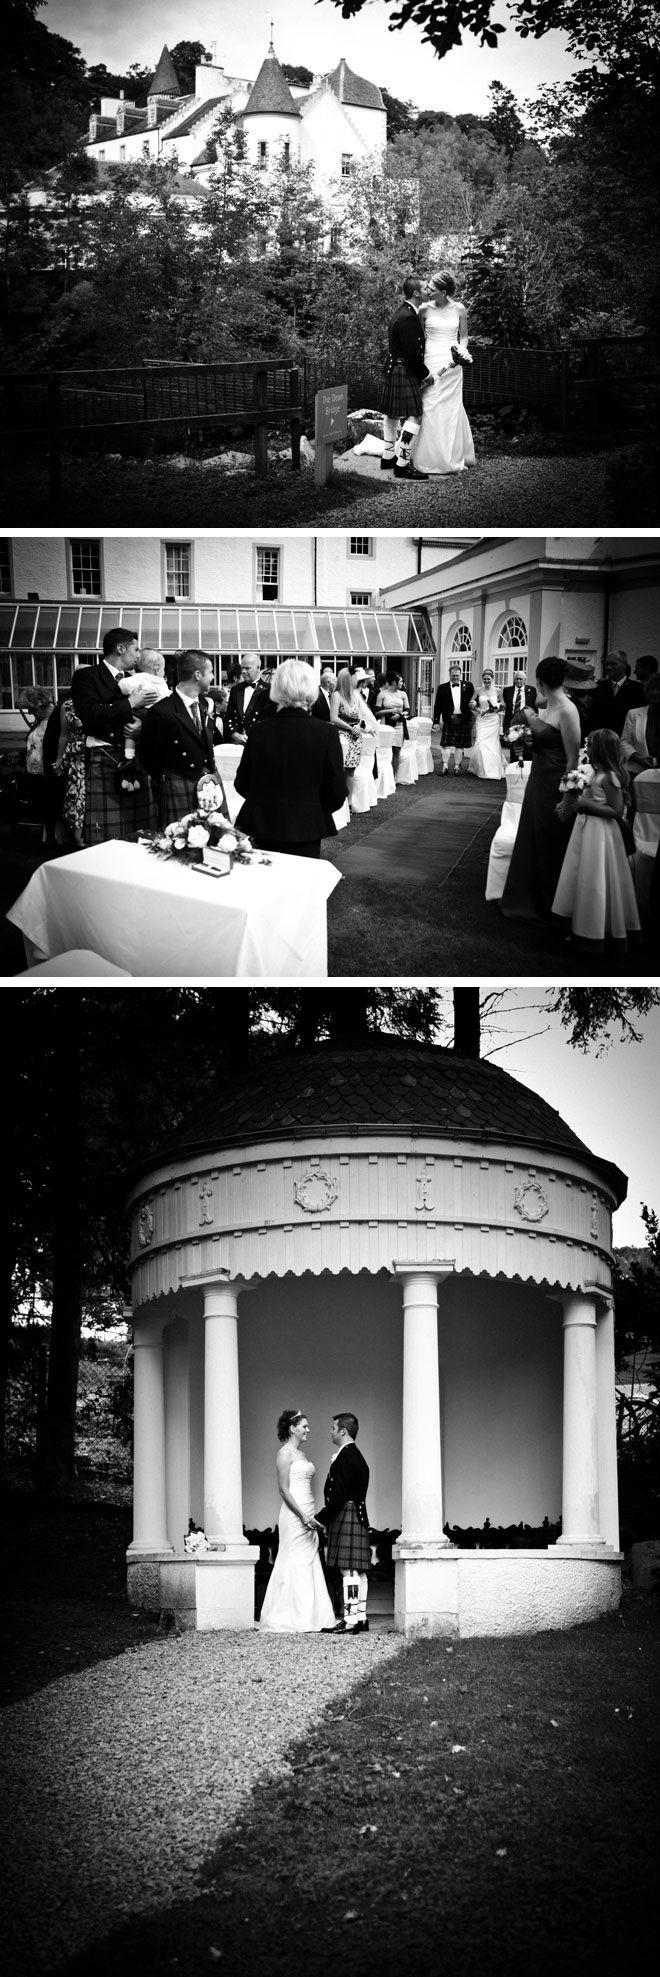 wedding venues in londonderry%0A Barony Castle wedding venue in Scotland   Visit www weddingvenues co